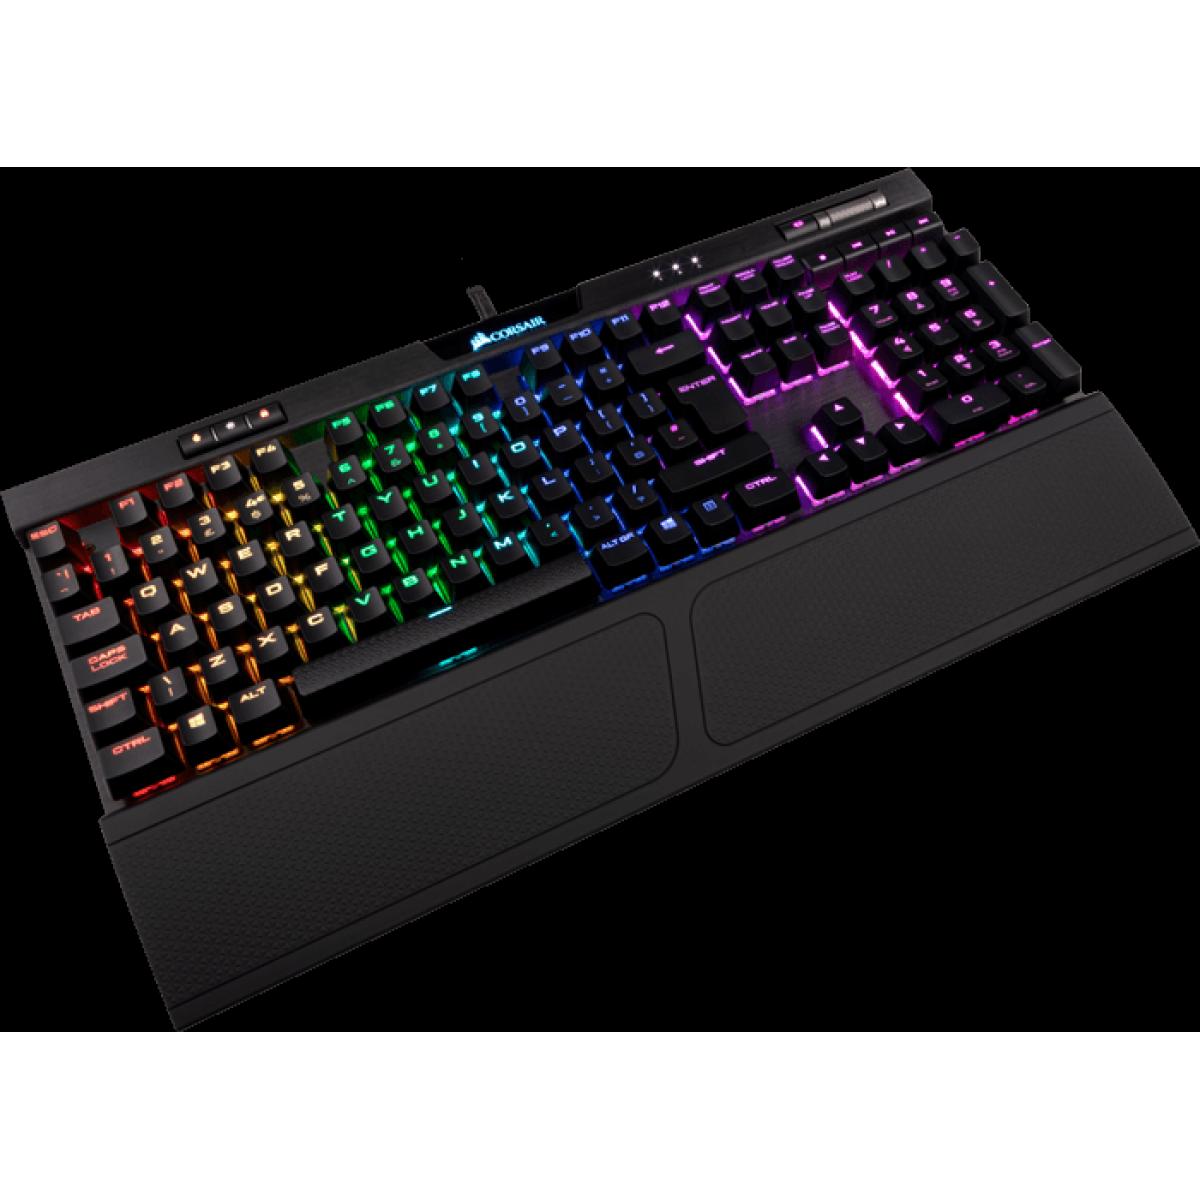 Teclado Mecânico Gamer Corsair K70 RGB MK.2, Switch Cherry MX Speed, ABNT2, CH-9109014-BR